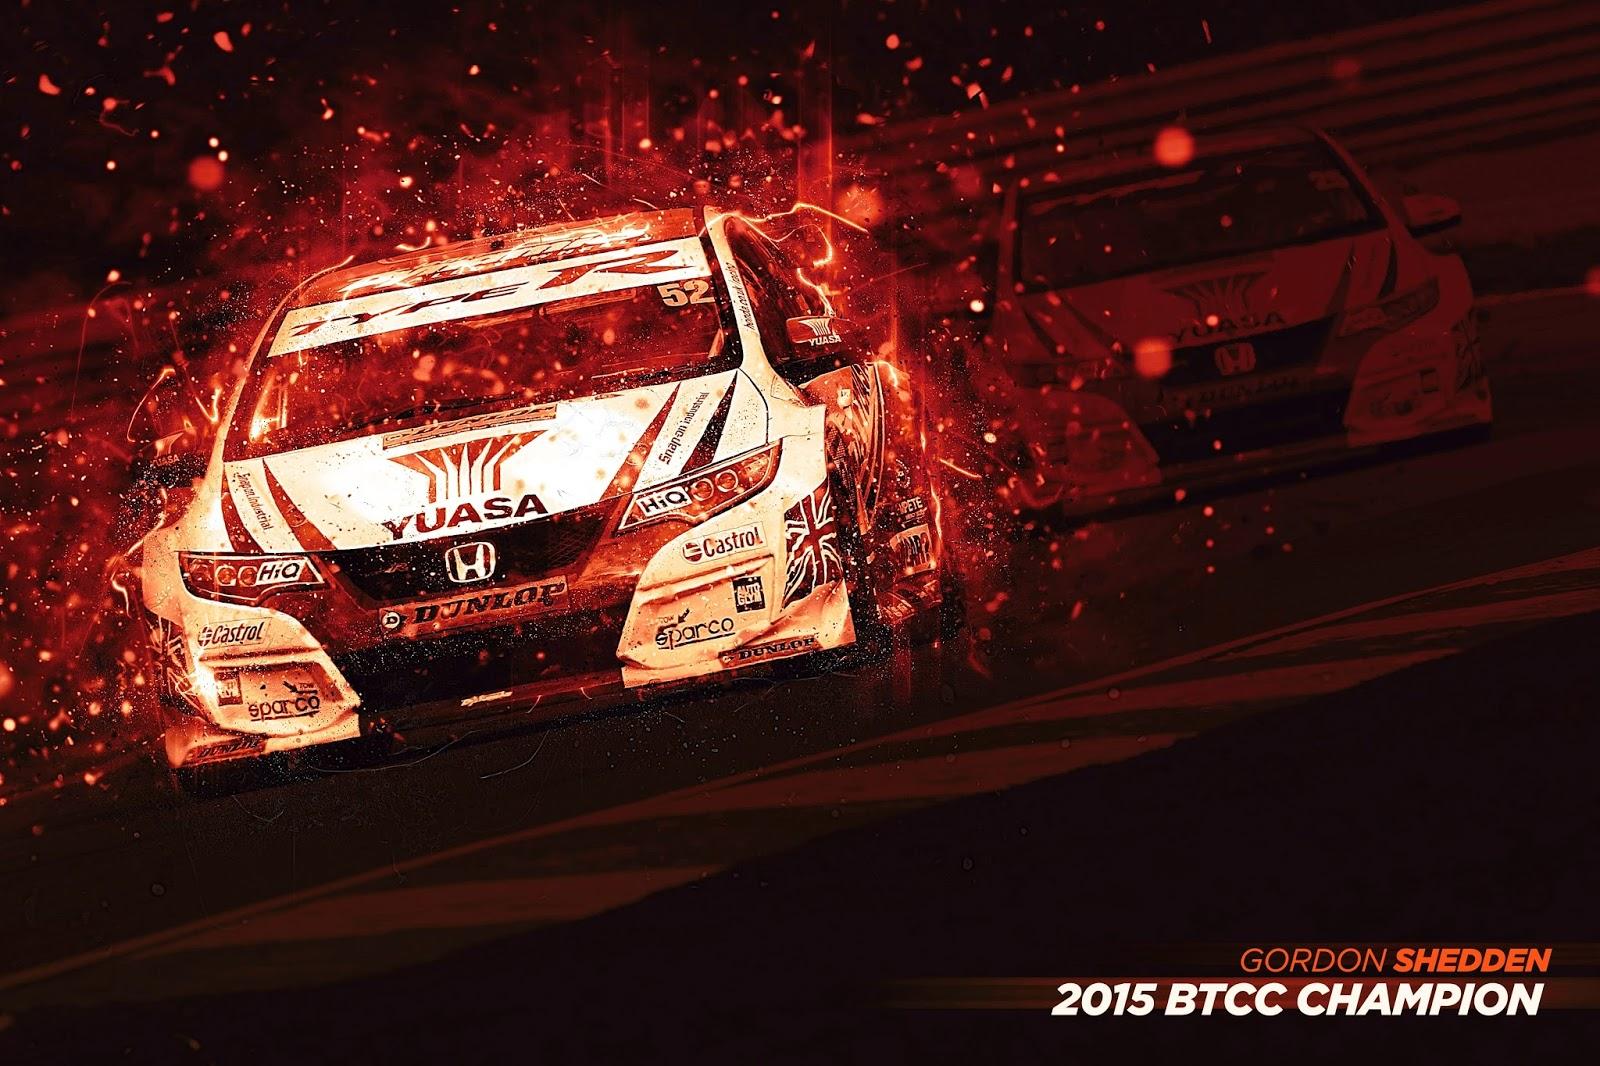 BTCC 2015 Champions Η συλλογή τίτλων μόλις ξεκίνησε για το νέο Civic Type R BTCC, Hatcback, Honda, Honda Civic, Honda Civic Type R, Rally, videos